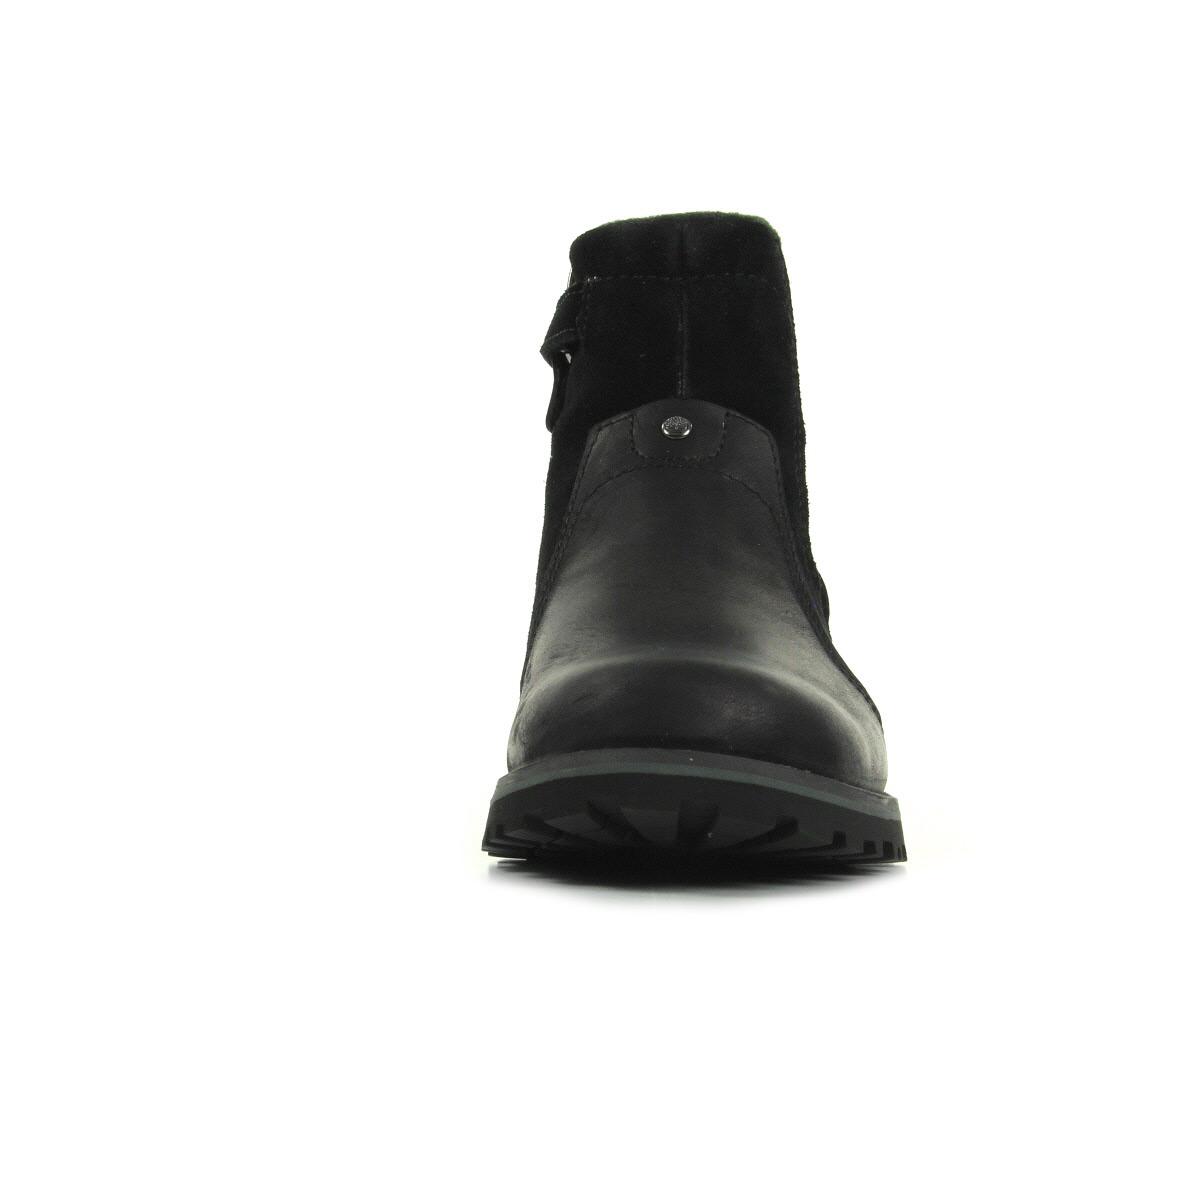 Boots Timberland Asphalt Trail Chelsea Black FG iJ4Sy0cs